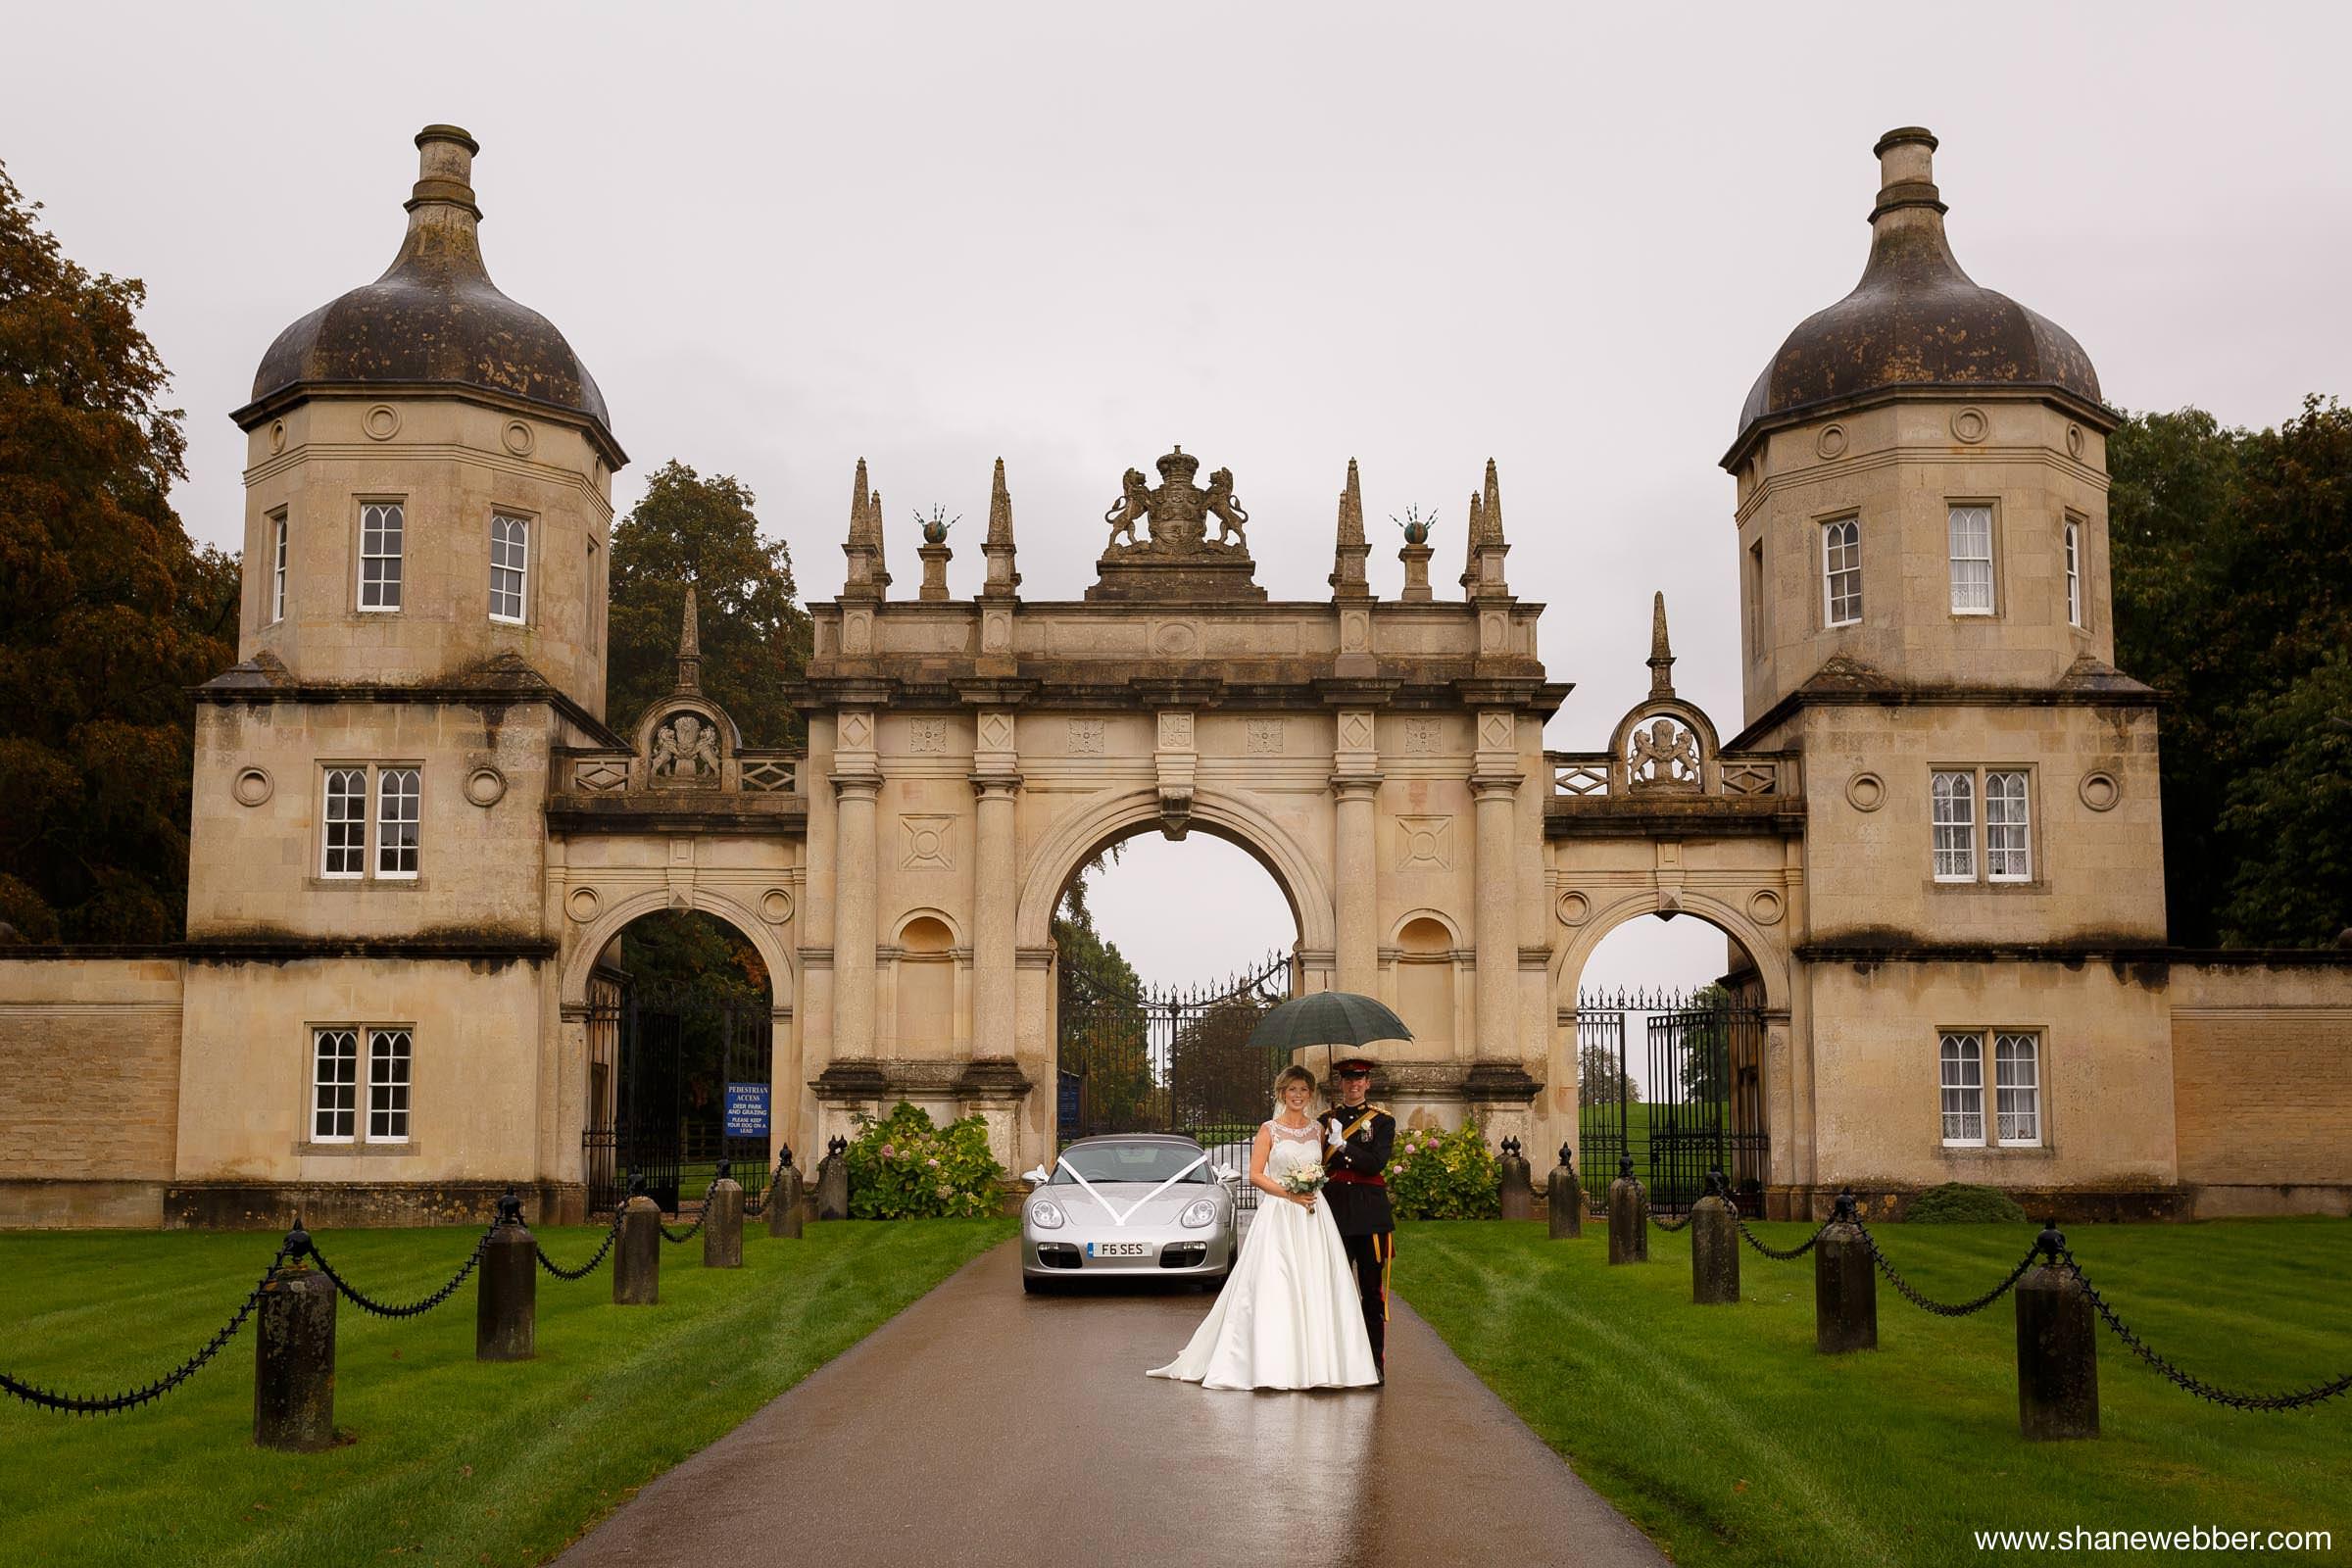 Burghley House gates